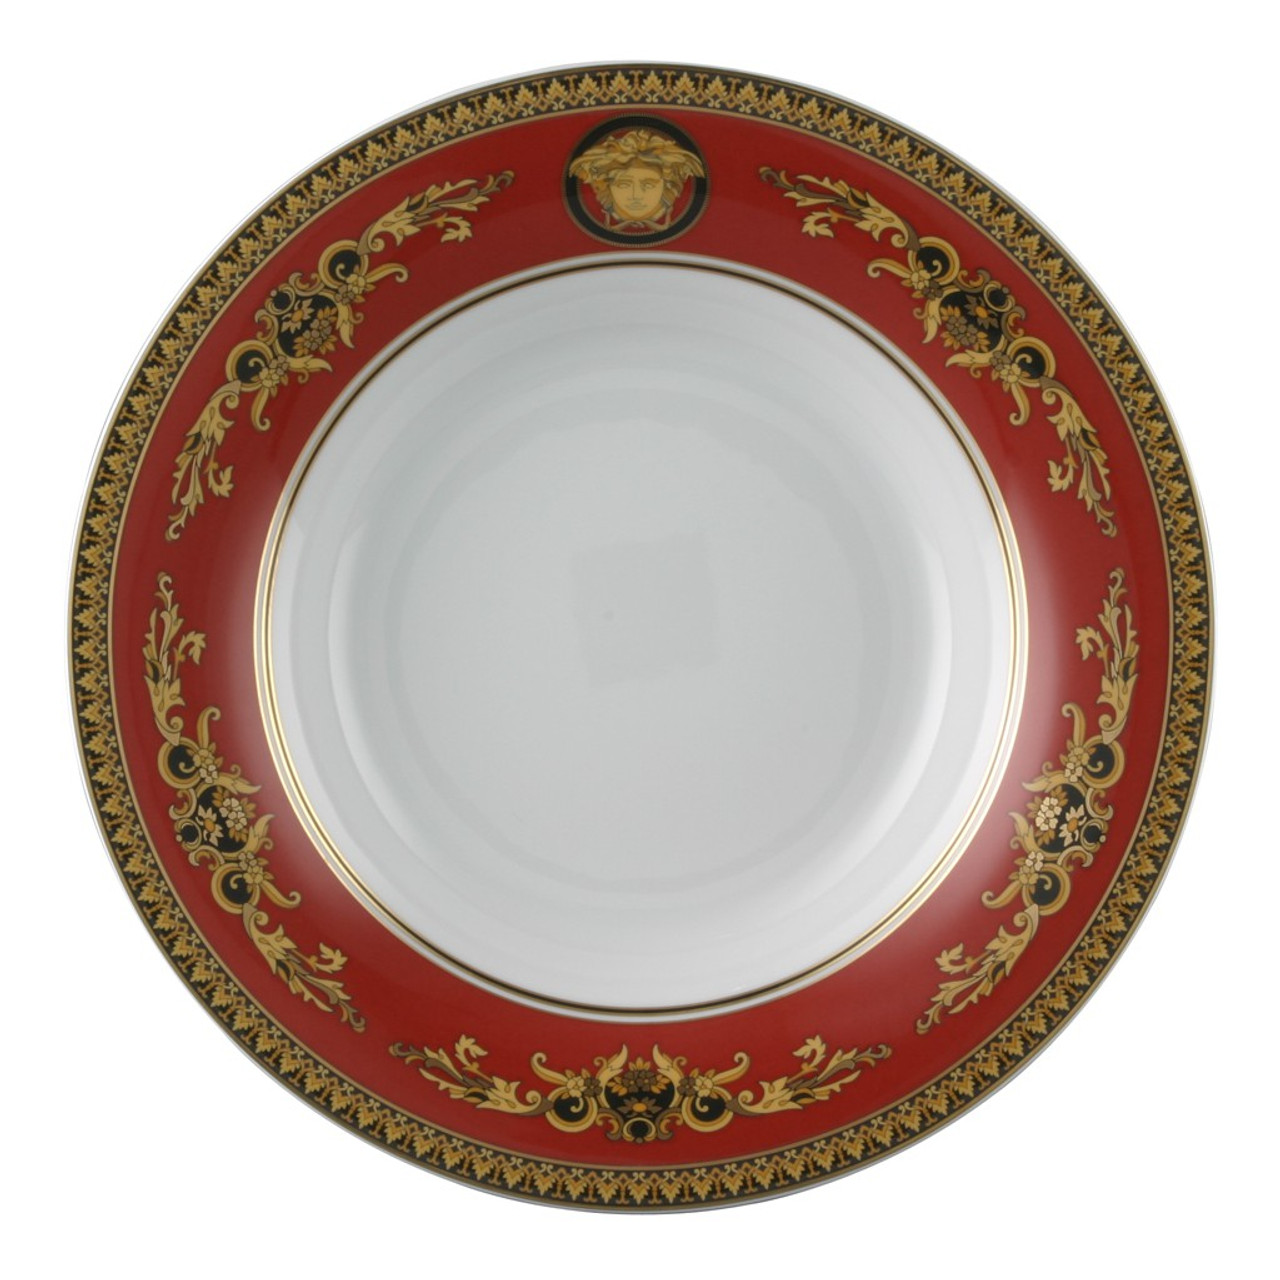 Gourmet Plate 12 1/4 inch | Versace Medusa Red  sc 1 st  Rosenthal & Gourmet Plate 12 1/4 inch | Medusa Red| Rosenthal Shop